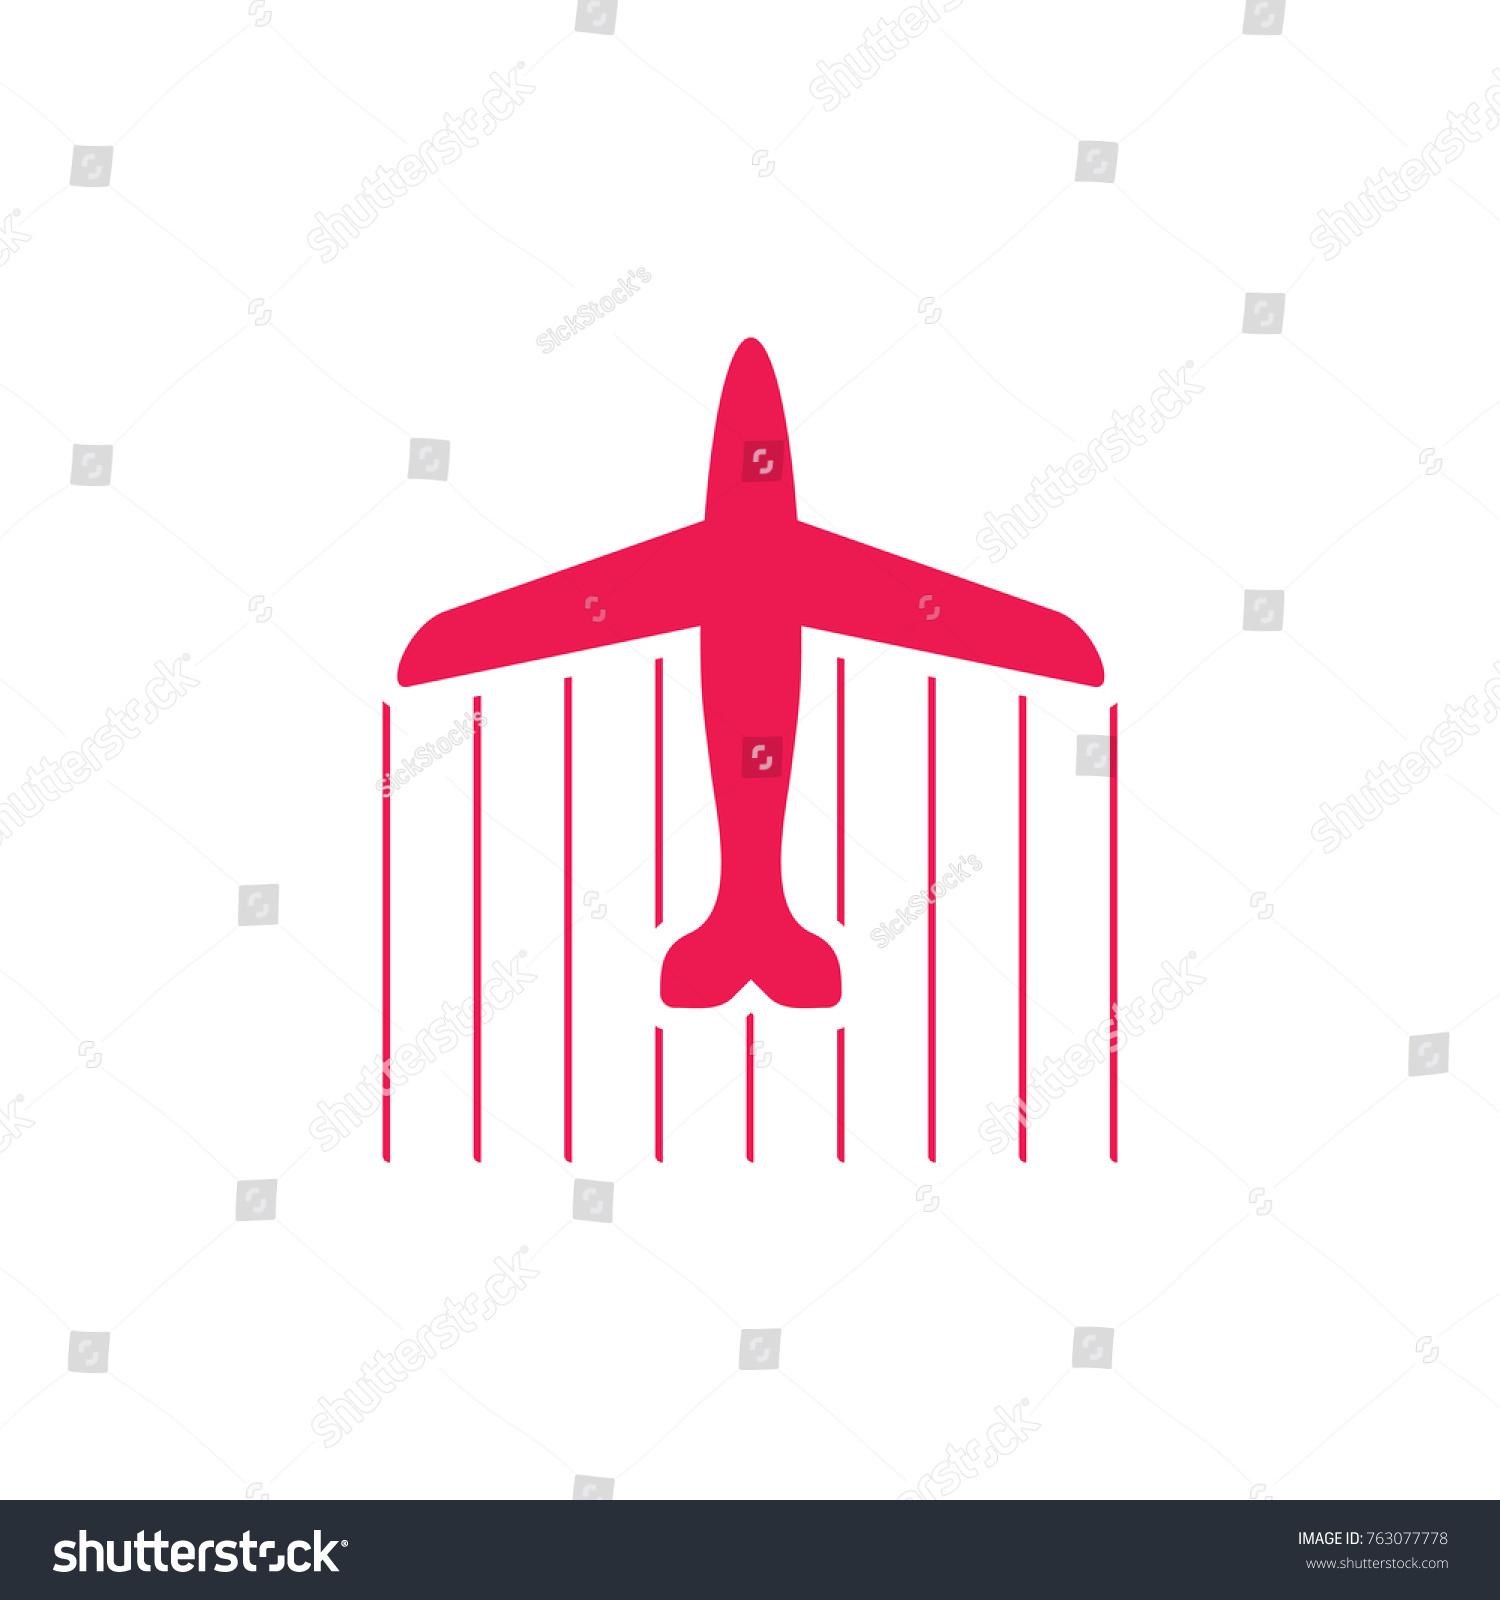 Jet Com Stock Symbol Choice Image Meaning Of Text Symbols